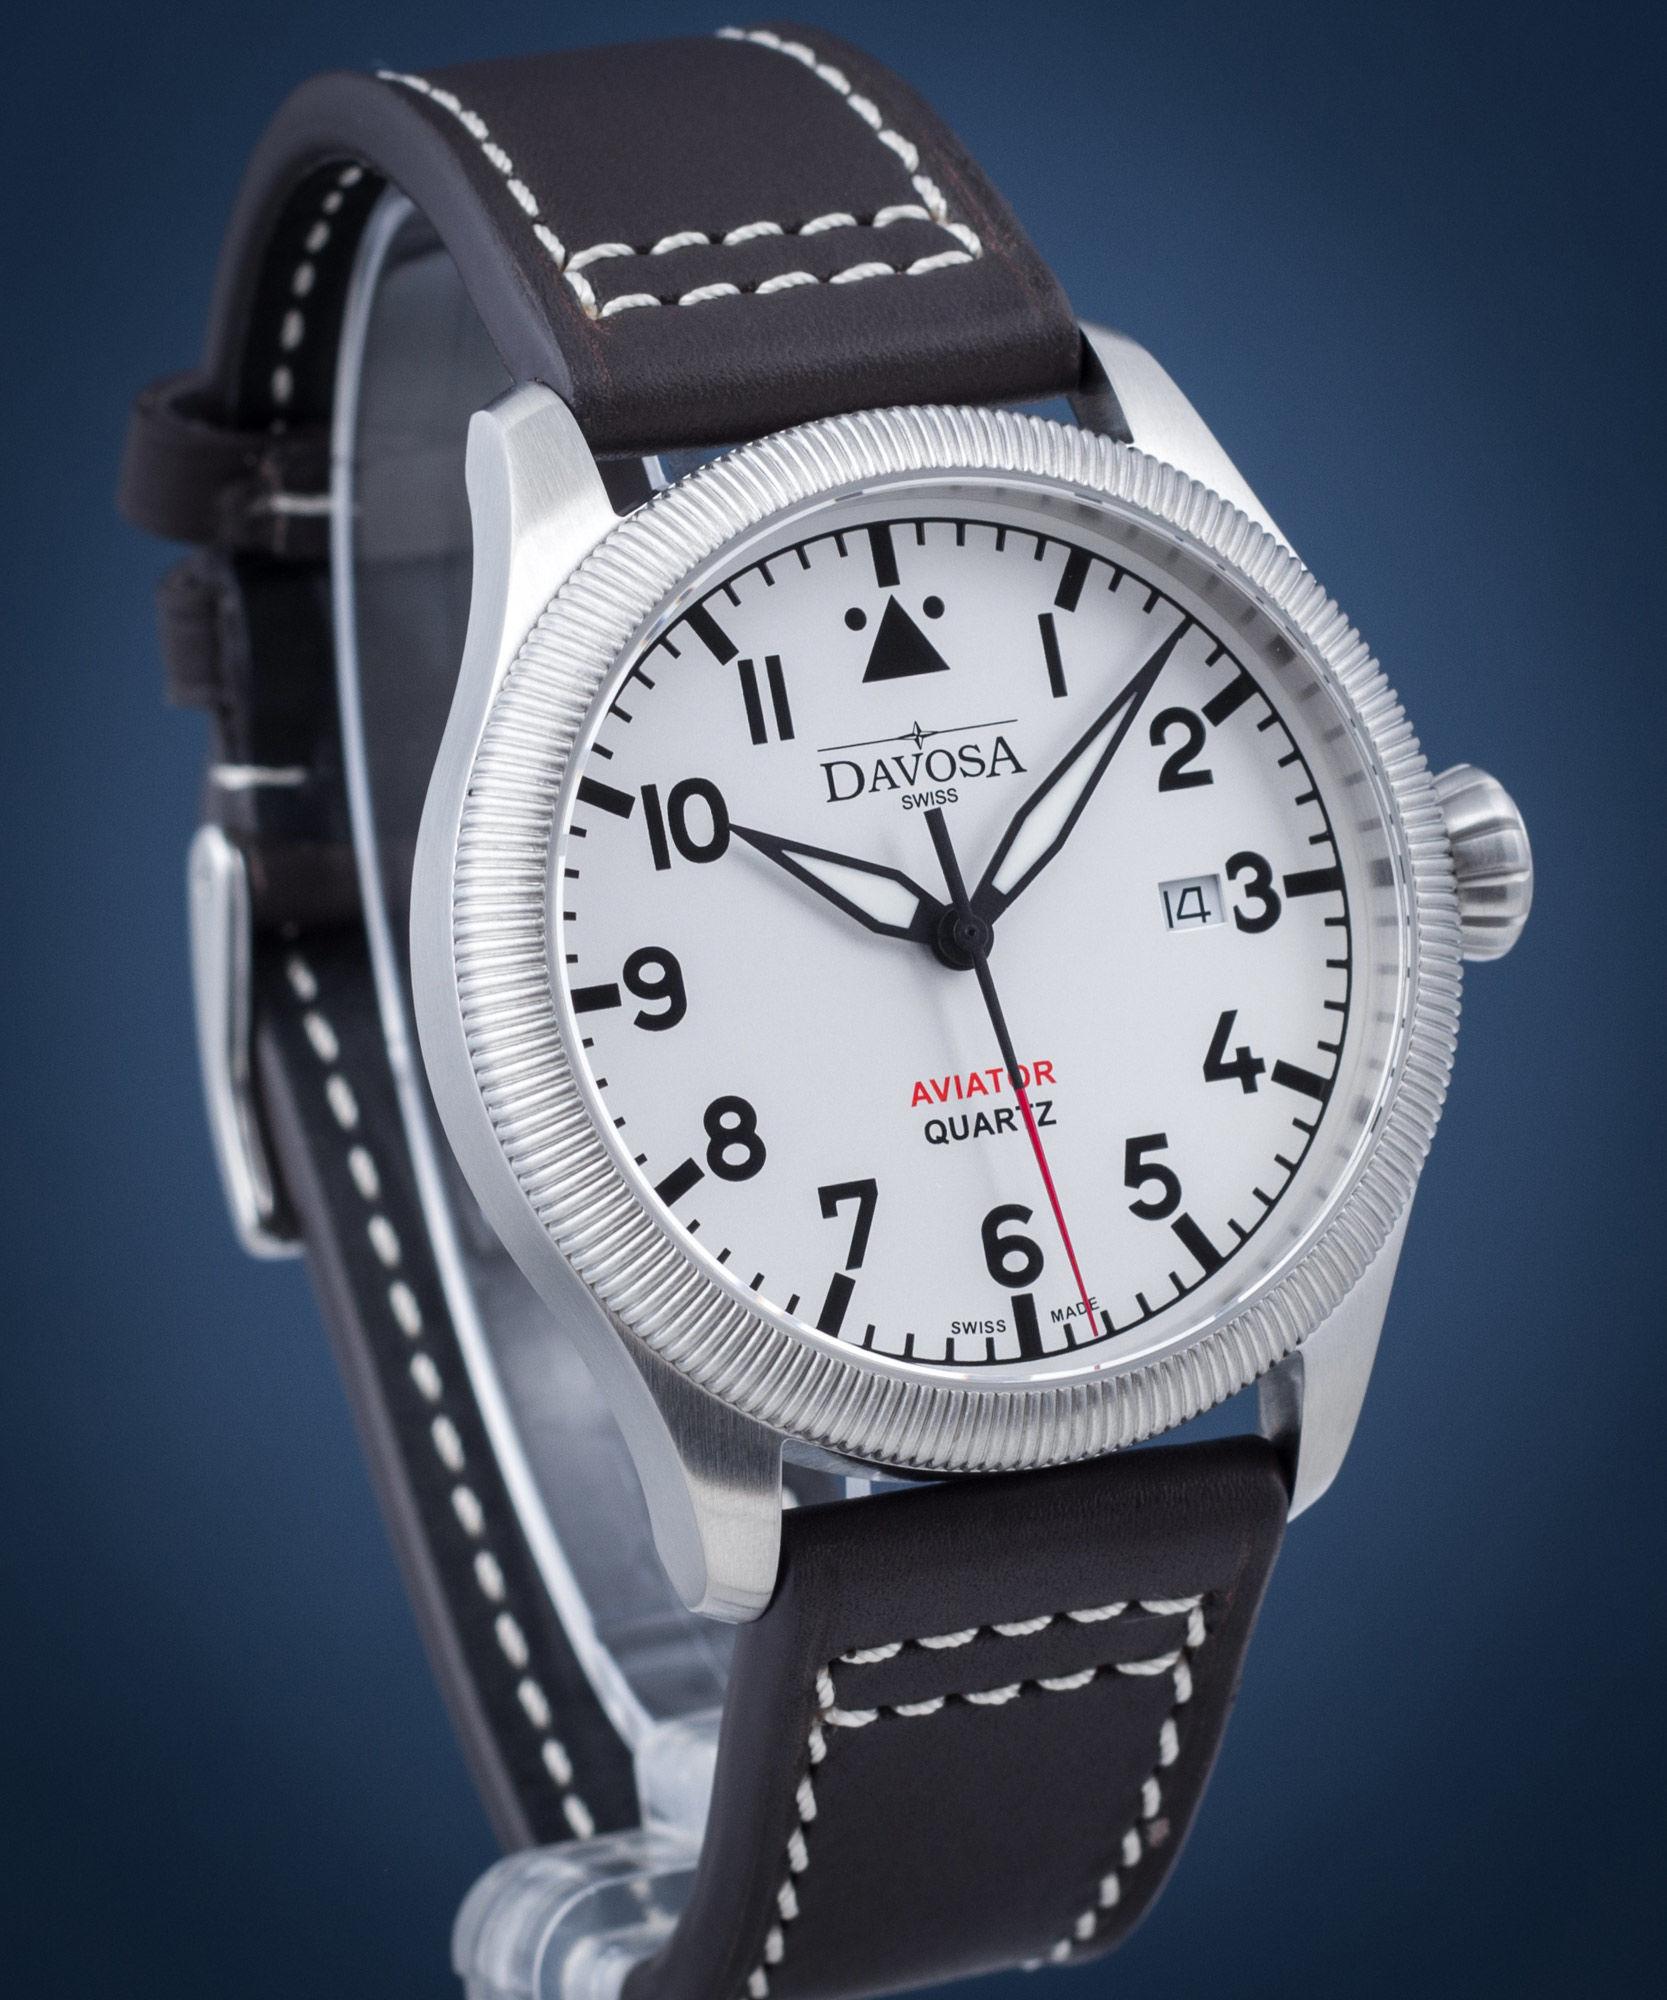 Zegarek męski Davosa Aviator Quartz